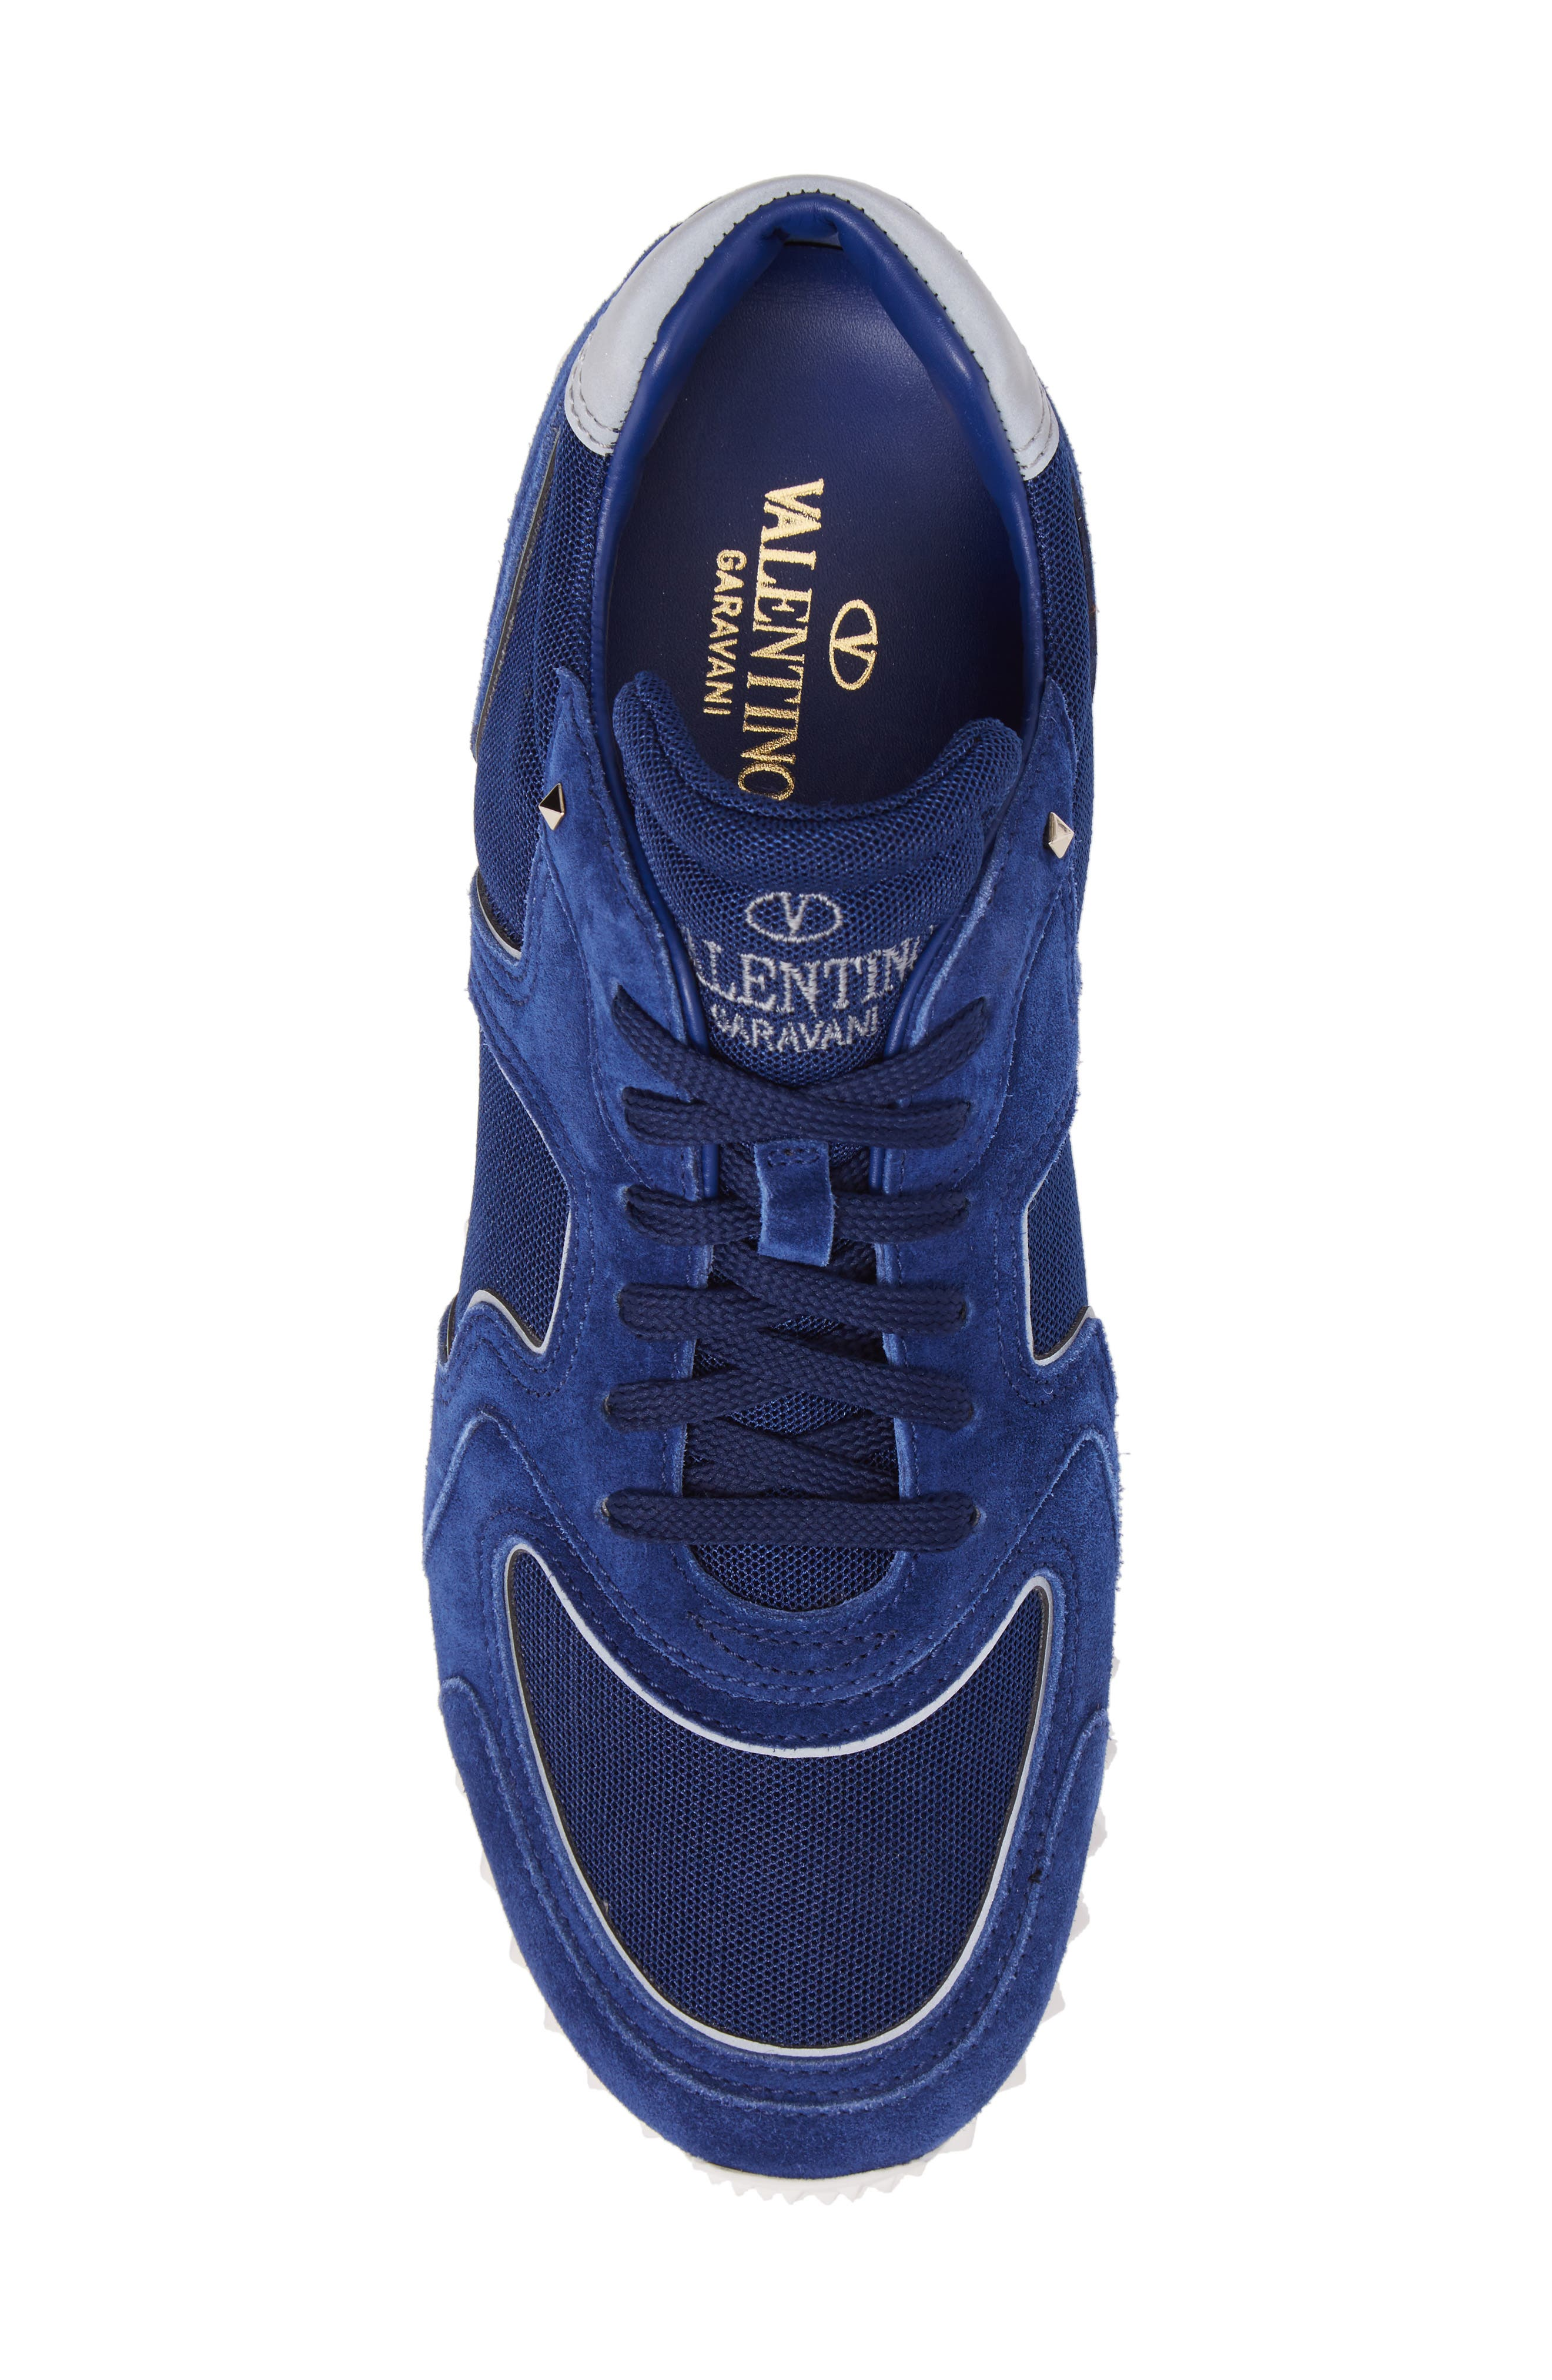 Soul AM Sneaker,                             Alternate thumbnail 5, color,                             Blue Royal/ Blue Royal